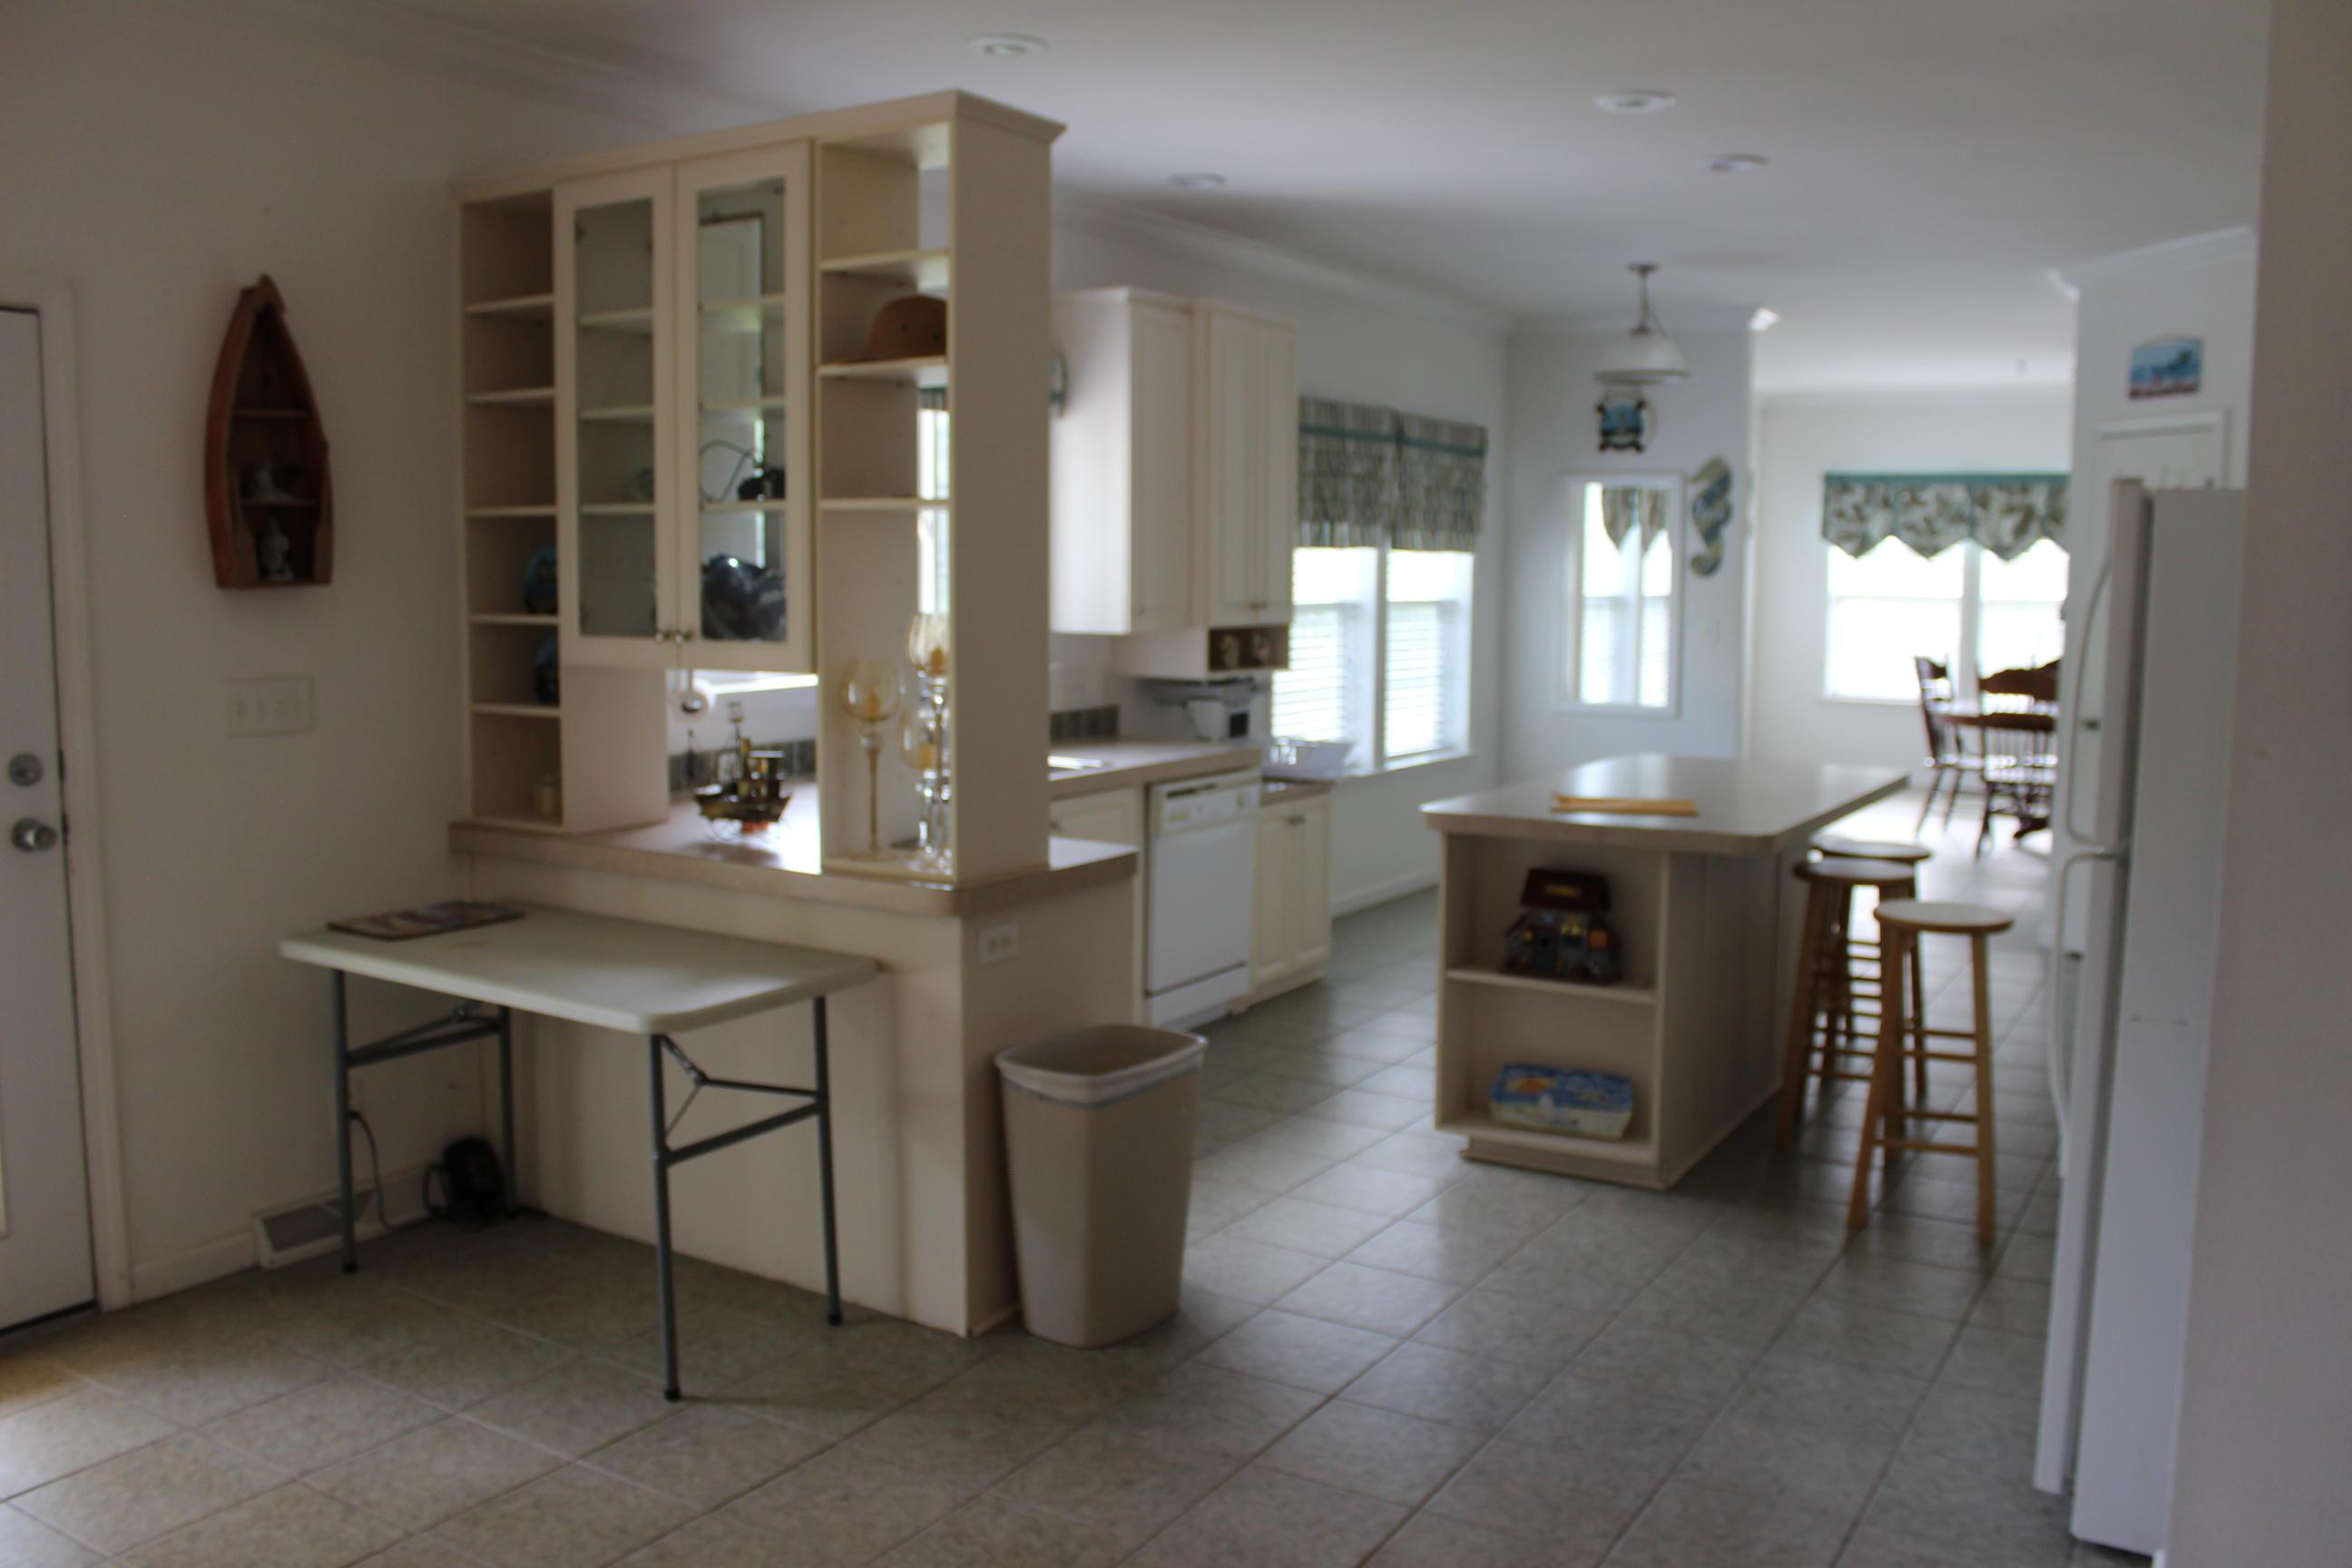 Edisto Island Homes For Sale - 8184 Oyster Factory, Edisto Island, SC - 34